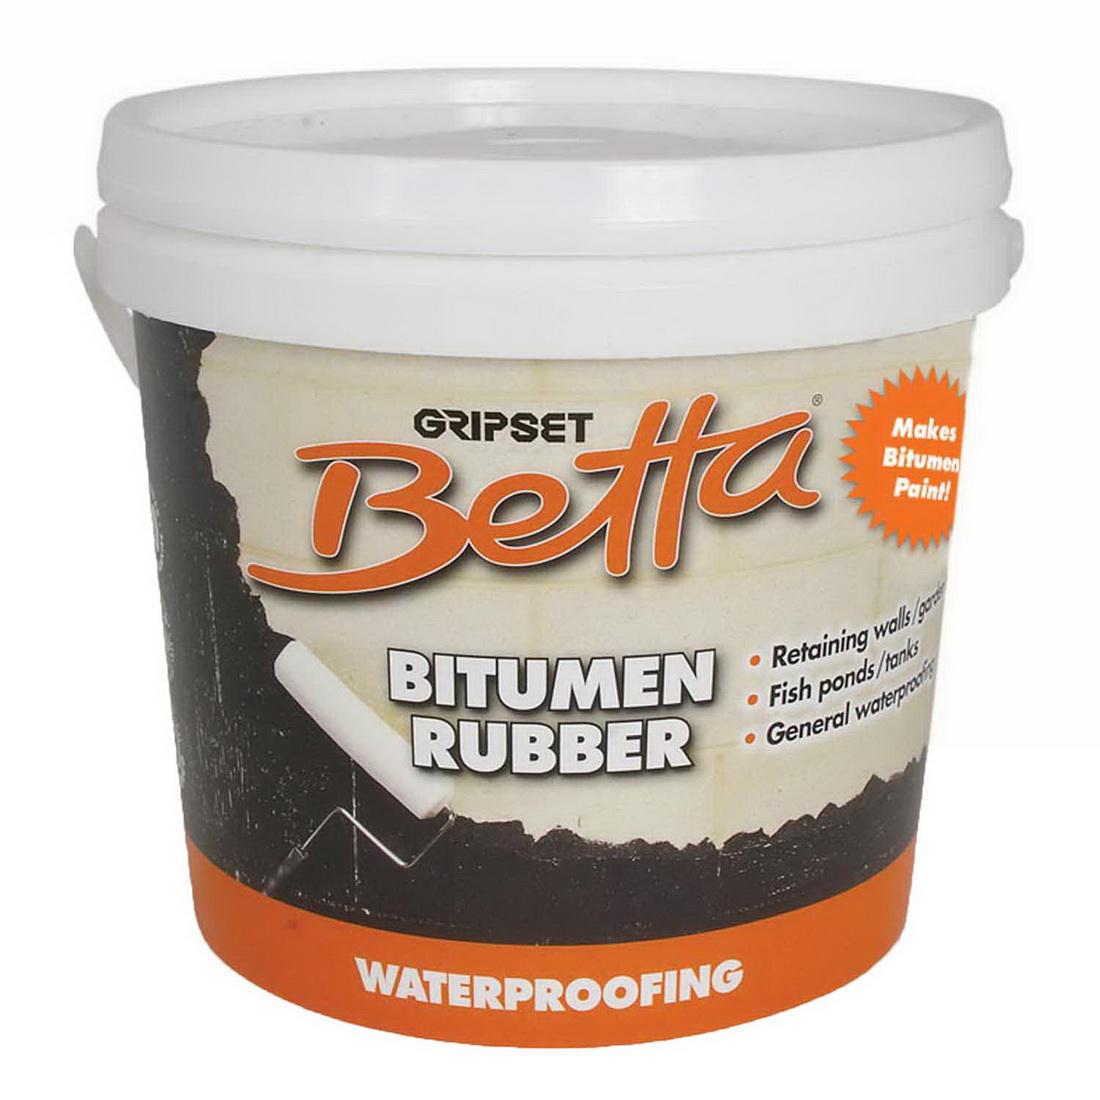 Gripset Betta Waterproofing Bitumen Rubber 4L Black GA-BETMB003